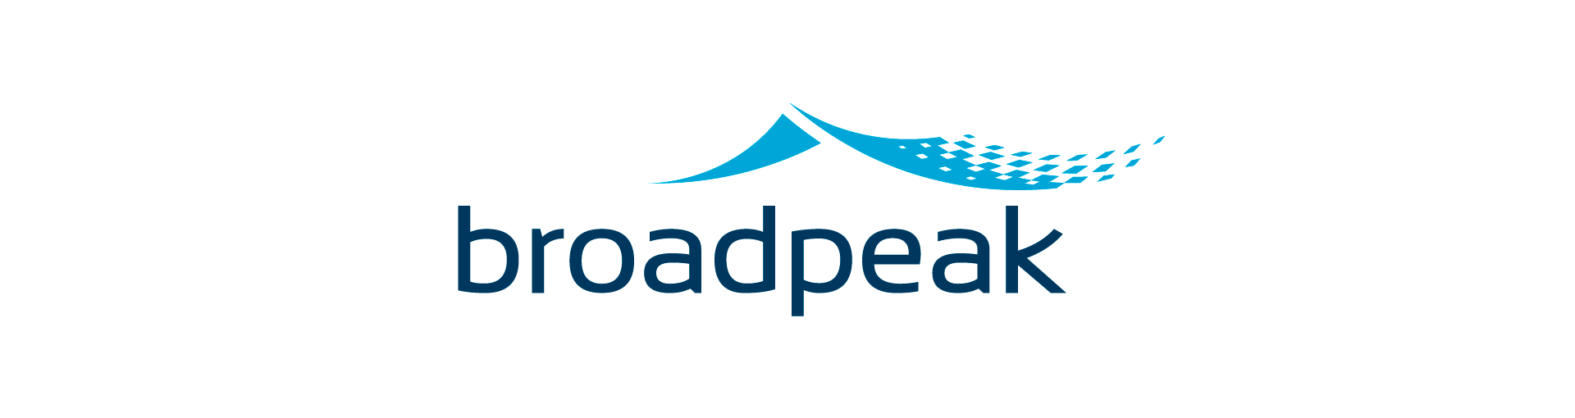 Landeau création Broadpeak logotype